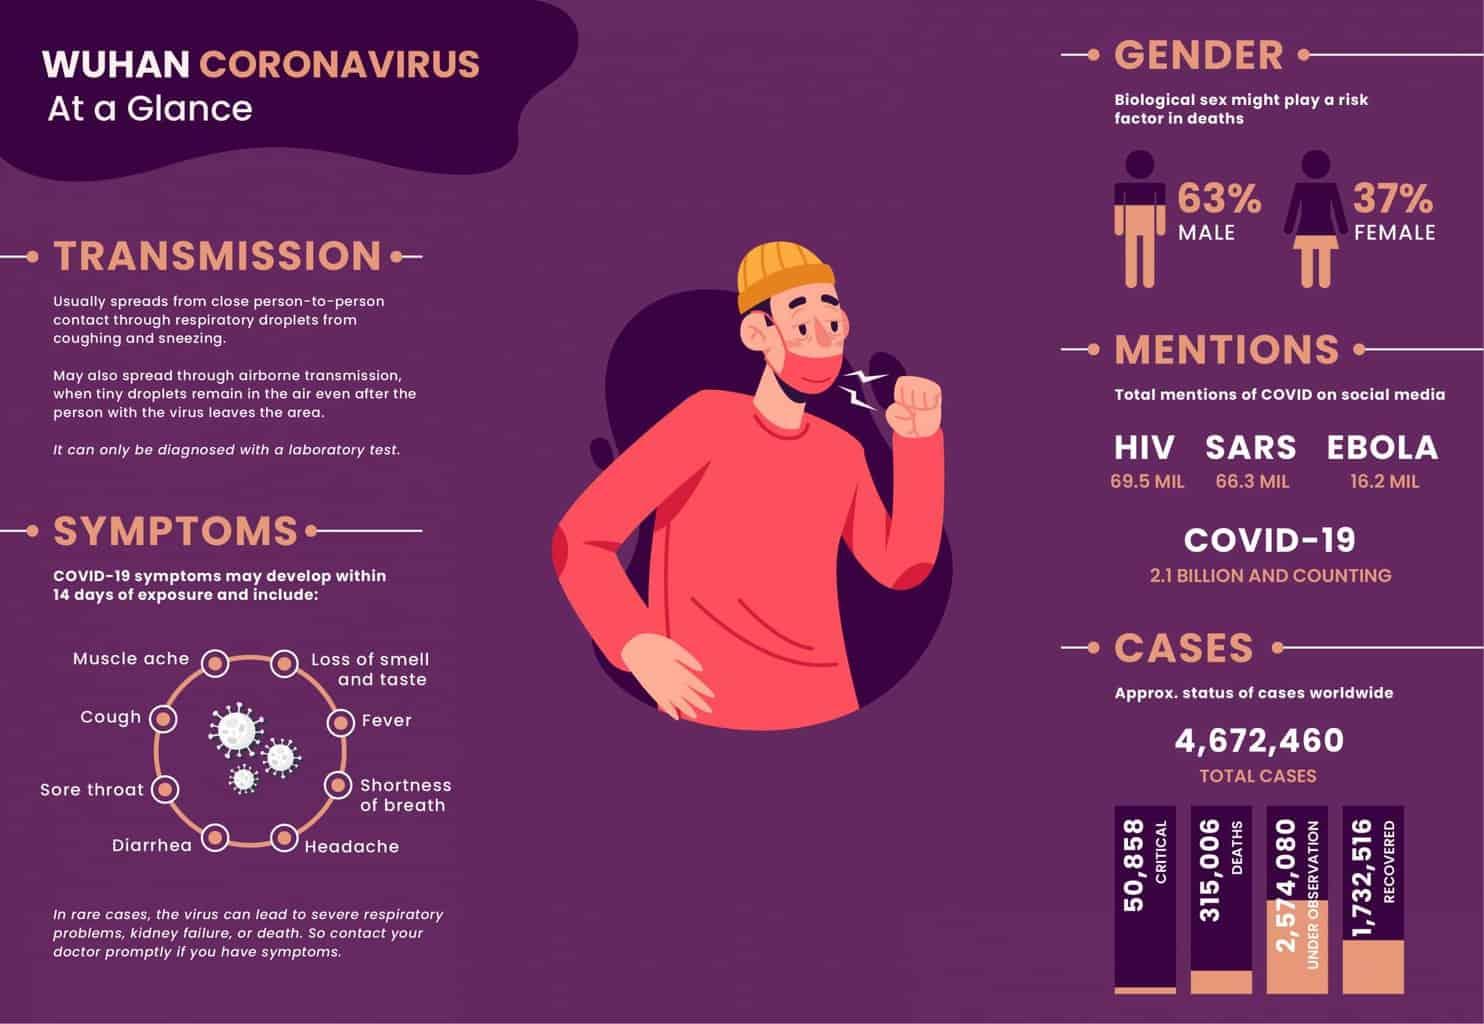 Mental health in corona outbreak - social media and healthcare